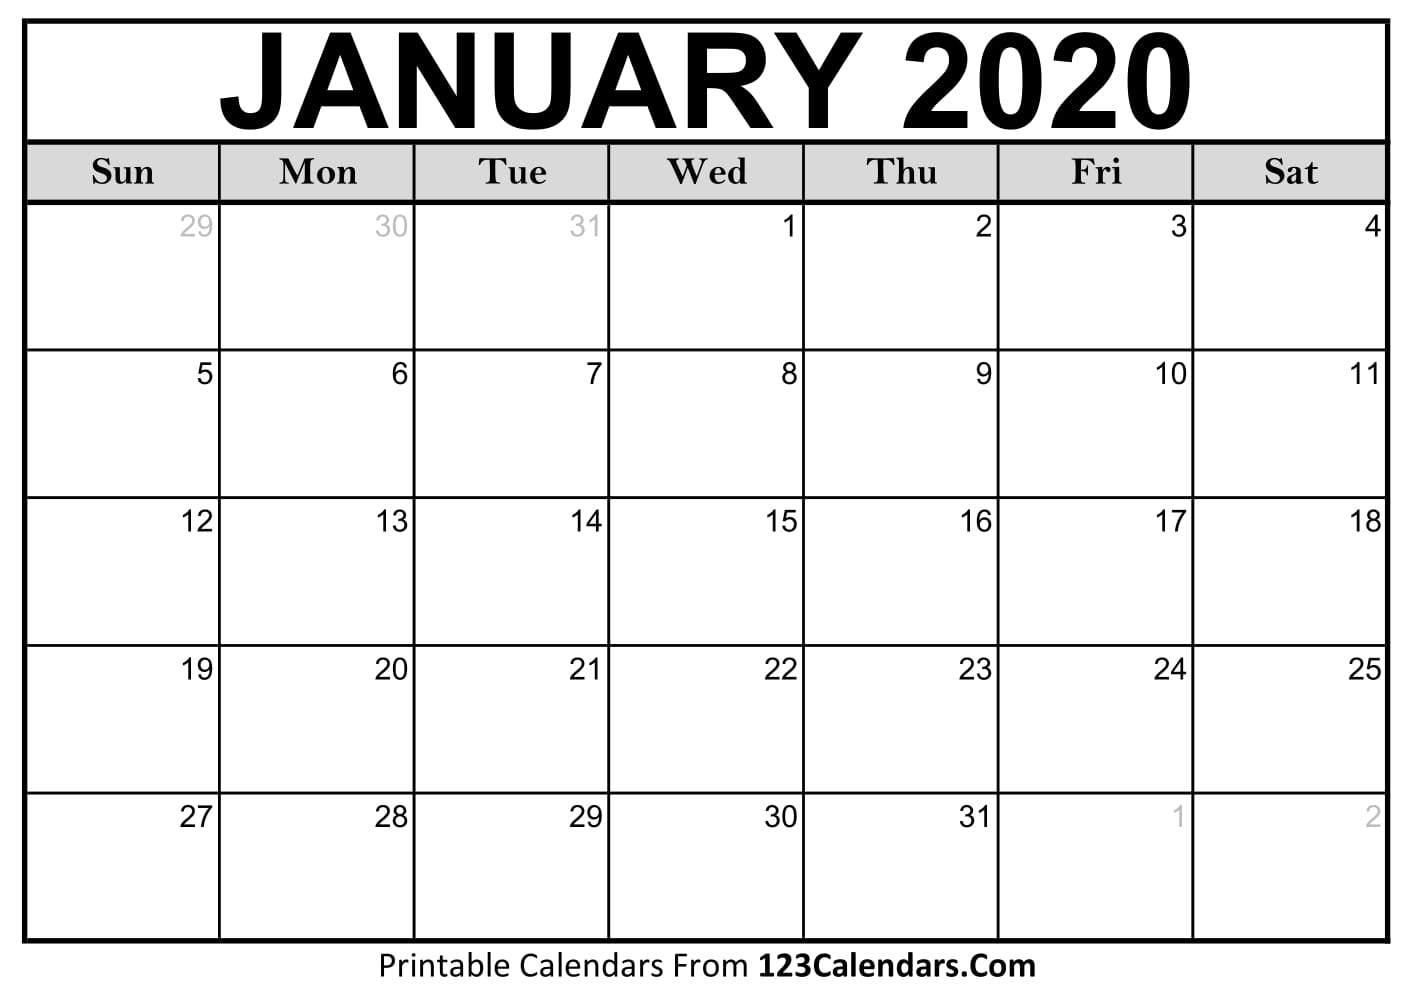 January 2020 Printable Calendar | 123Calendars in 2020 Free Printable Calendar Large Numbers